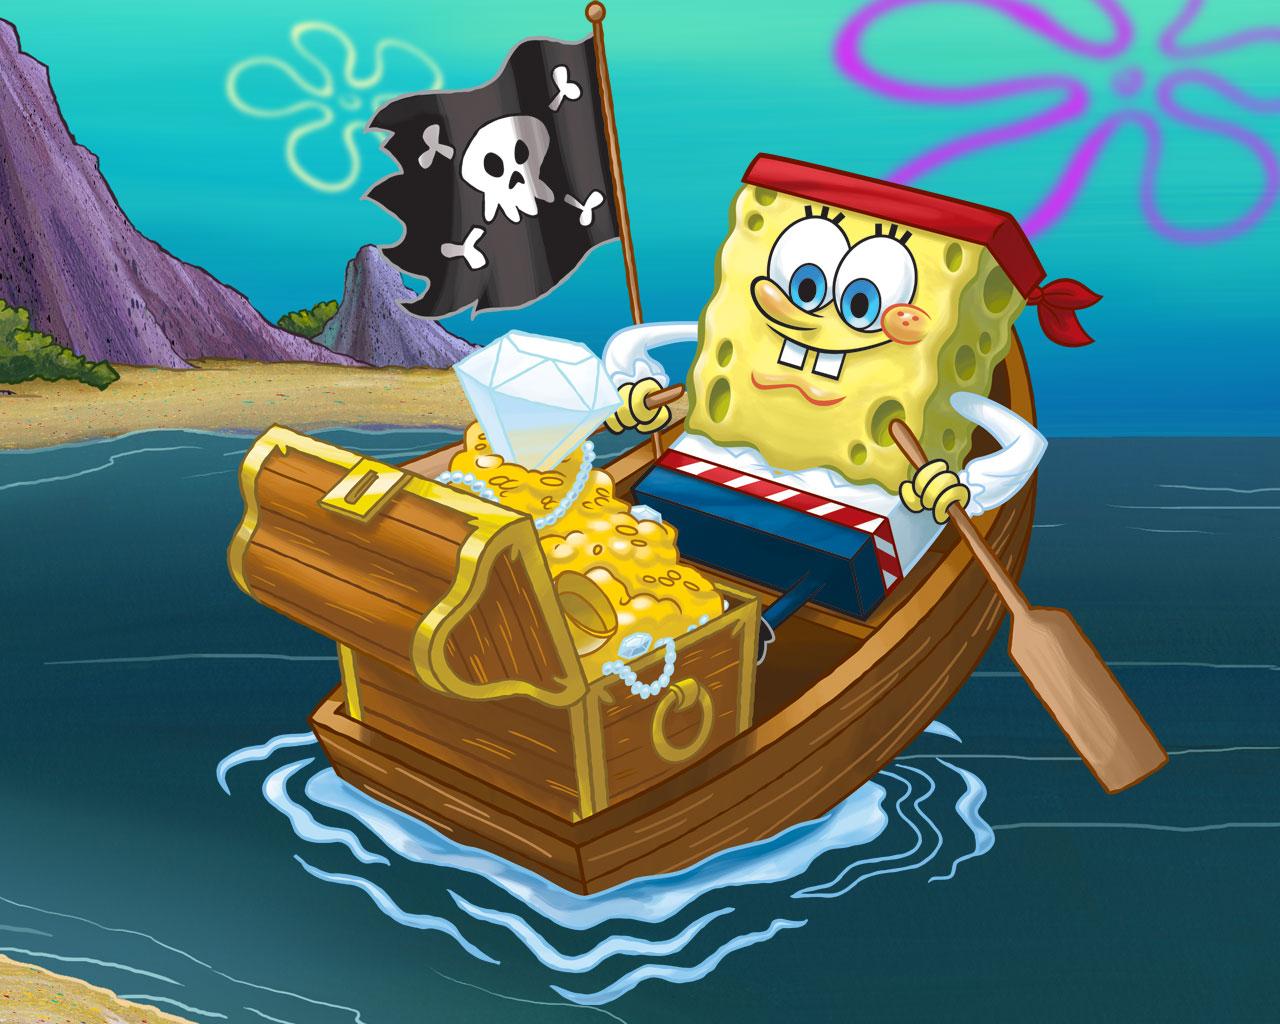 Cute Patrick Star Wallpaper Spongebob Wallpapers Free Download Wallpaper Zoo